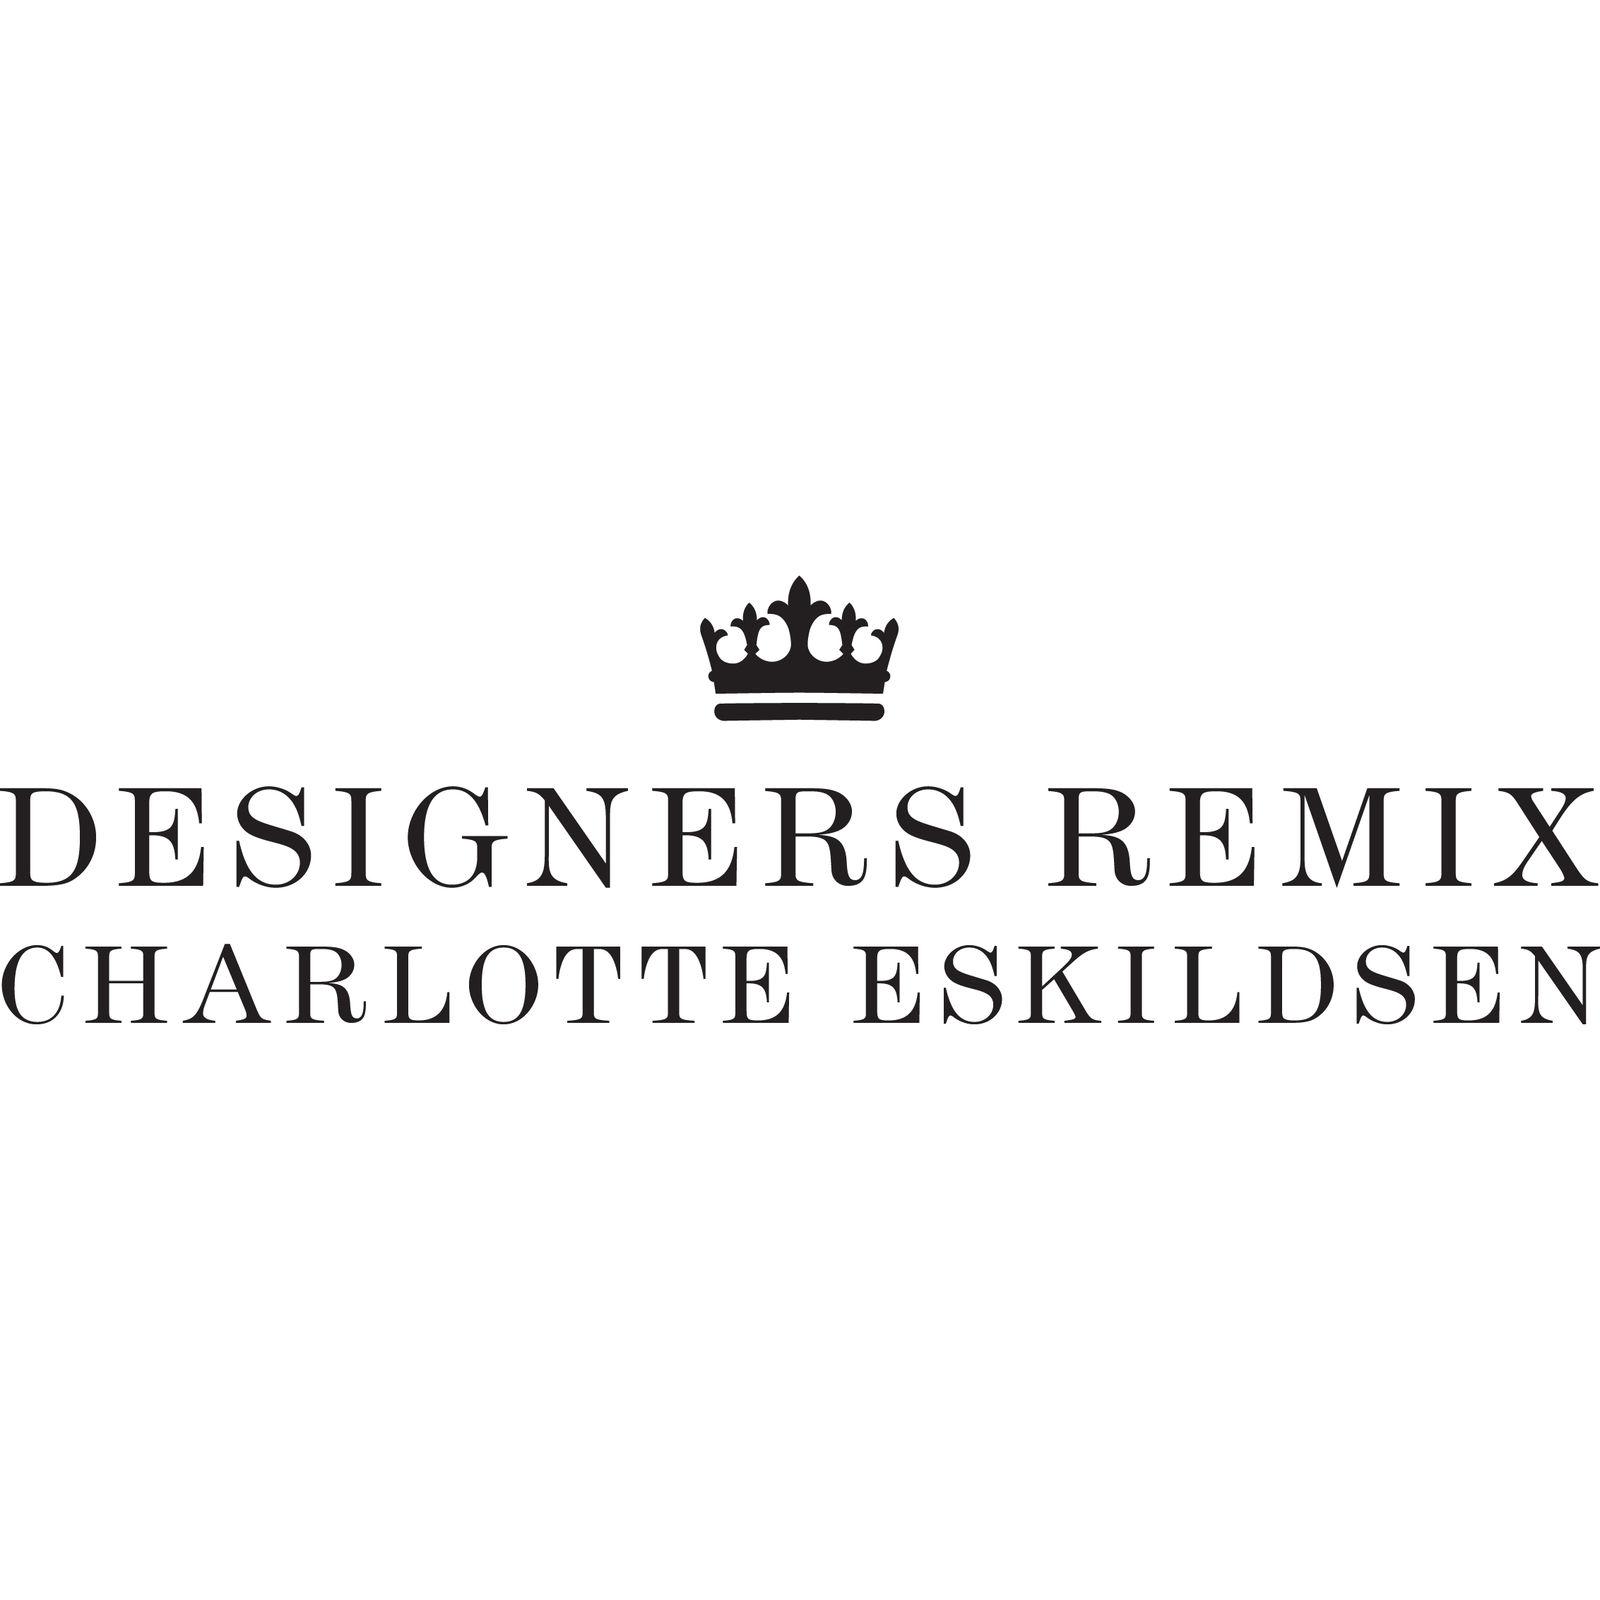 DESIGNERS REMIX (Image 1)